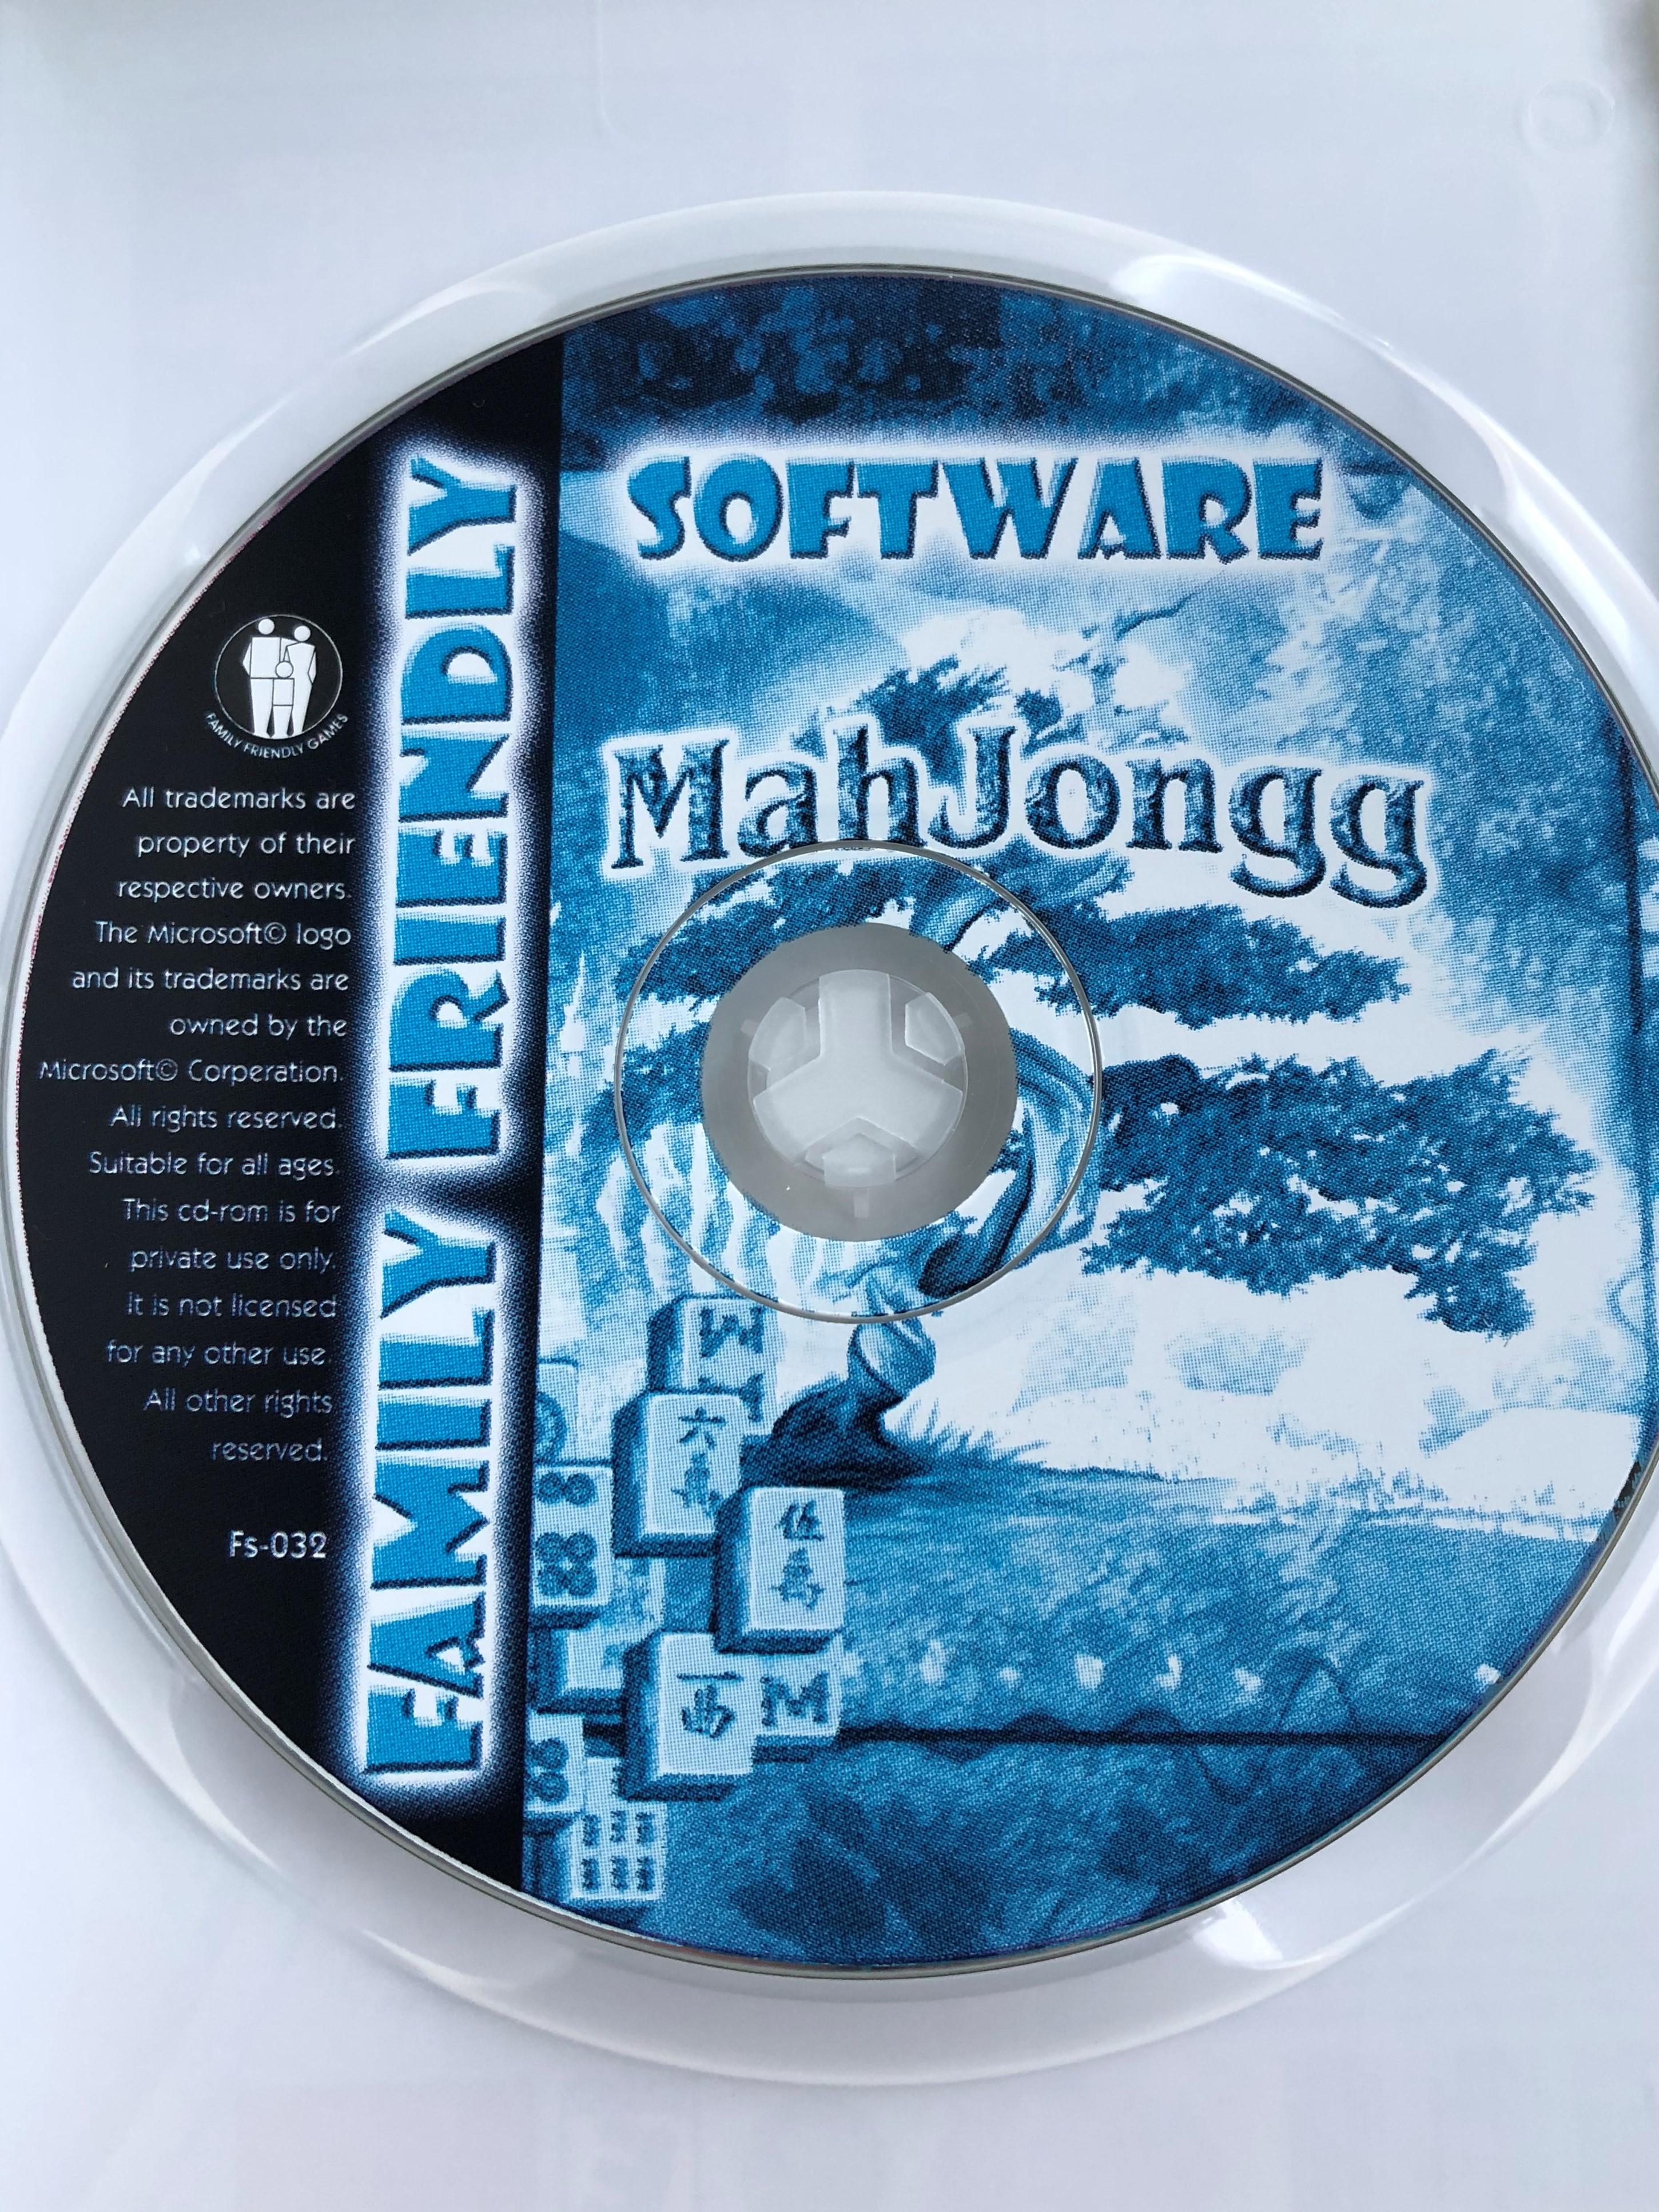 mahjongg-thinking-game-family-friendly-software-pc-cd-rom-2.jpg